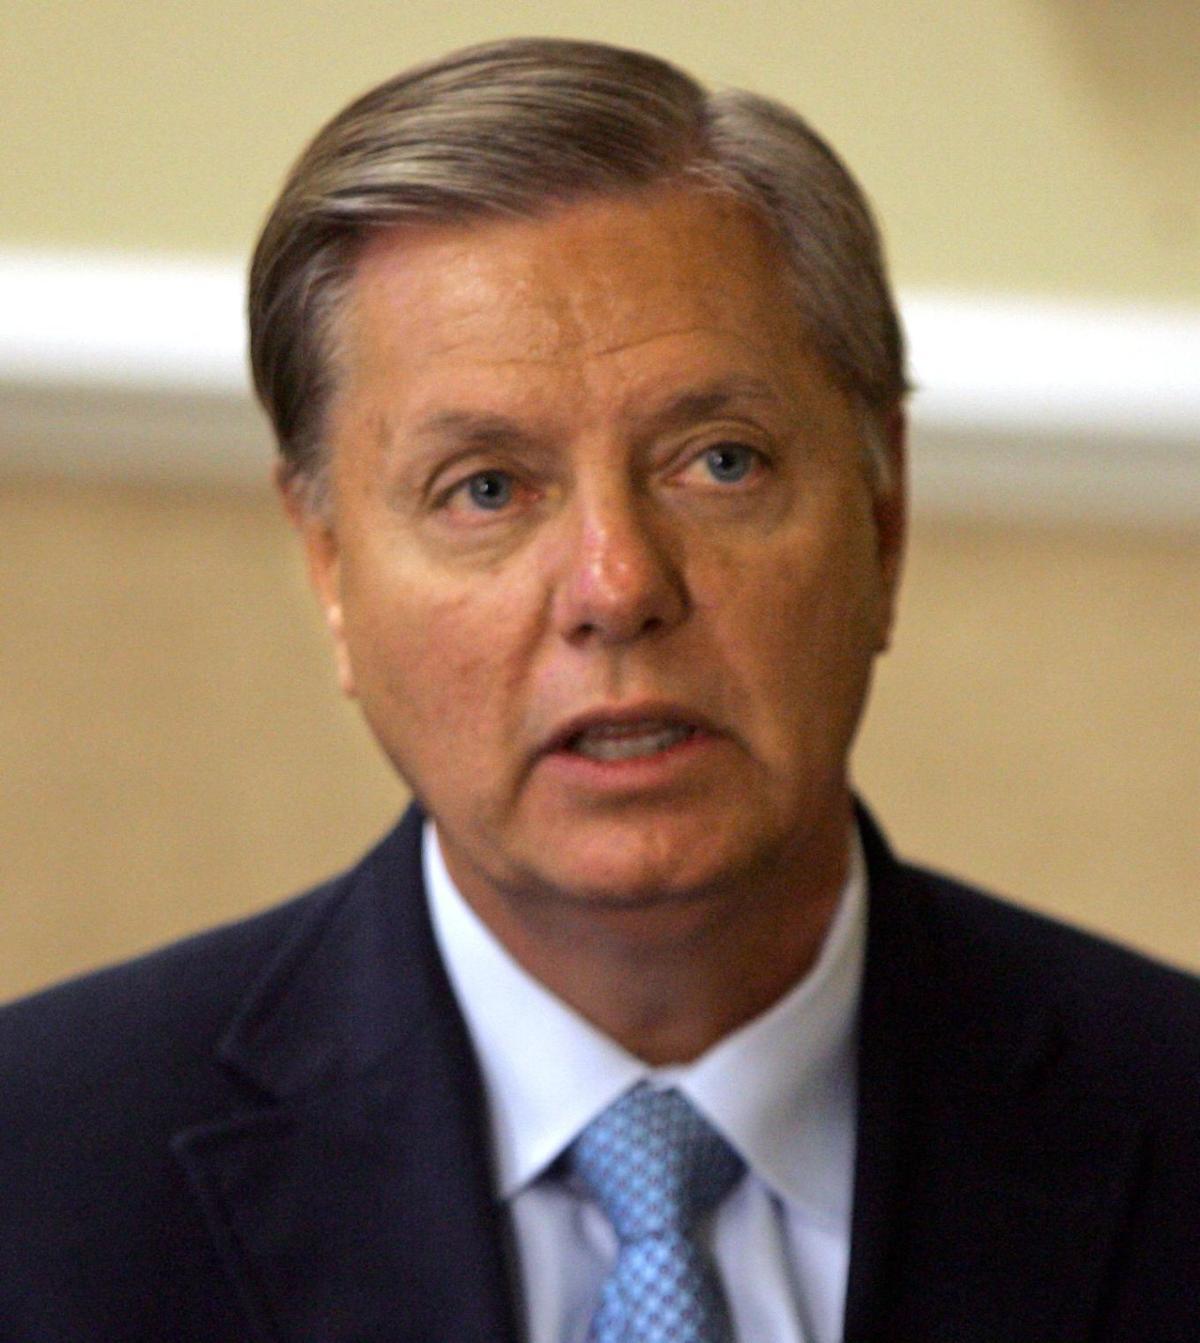 Graham to GOP: Embrace Reagan conservatism